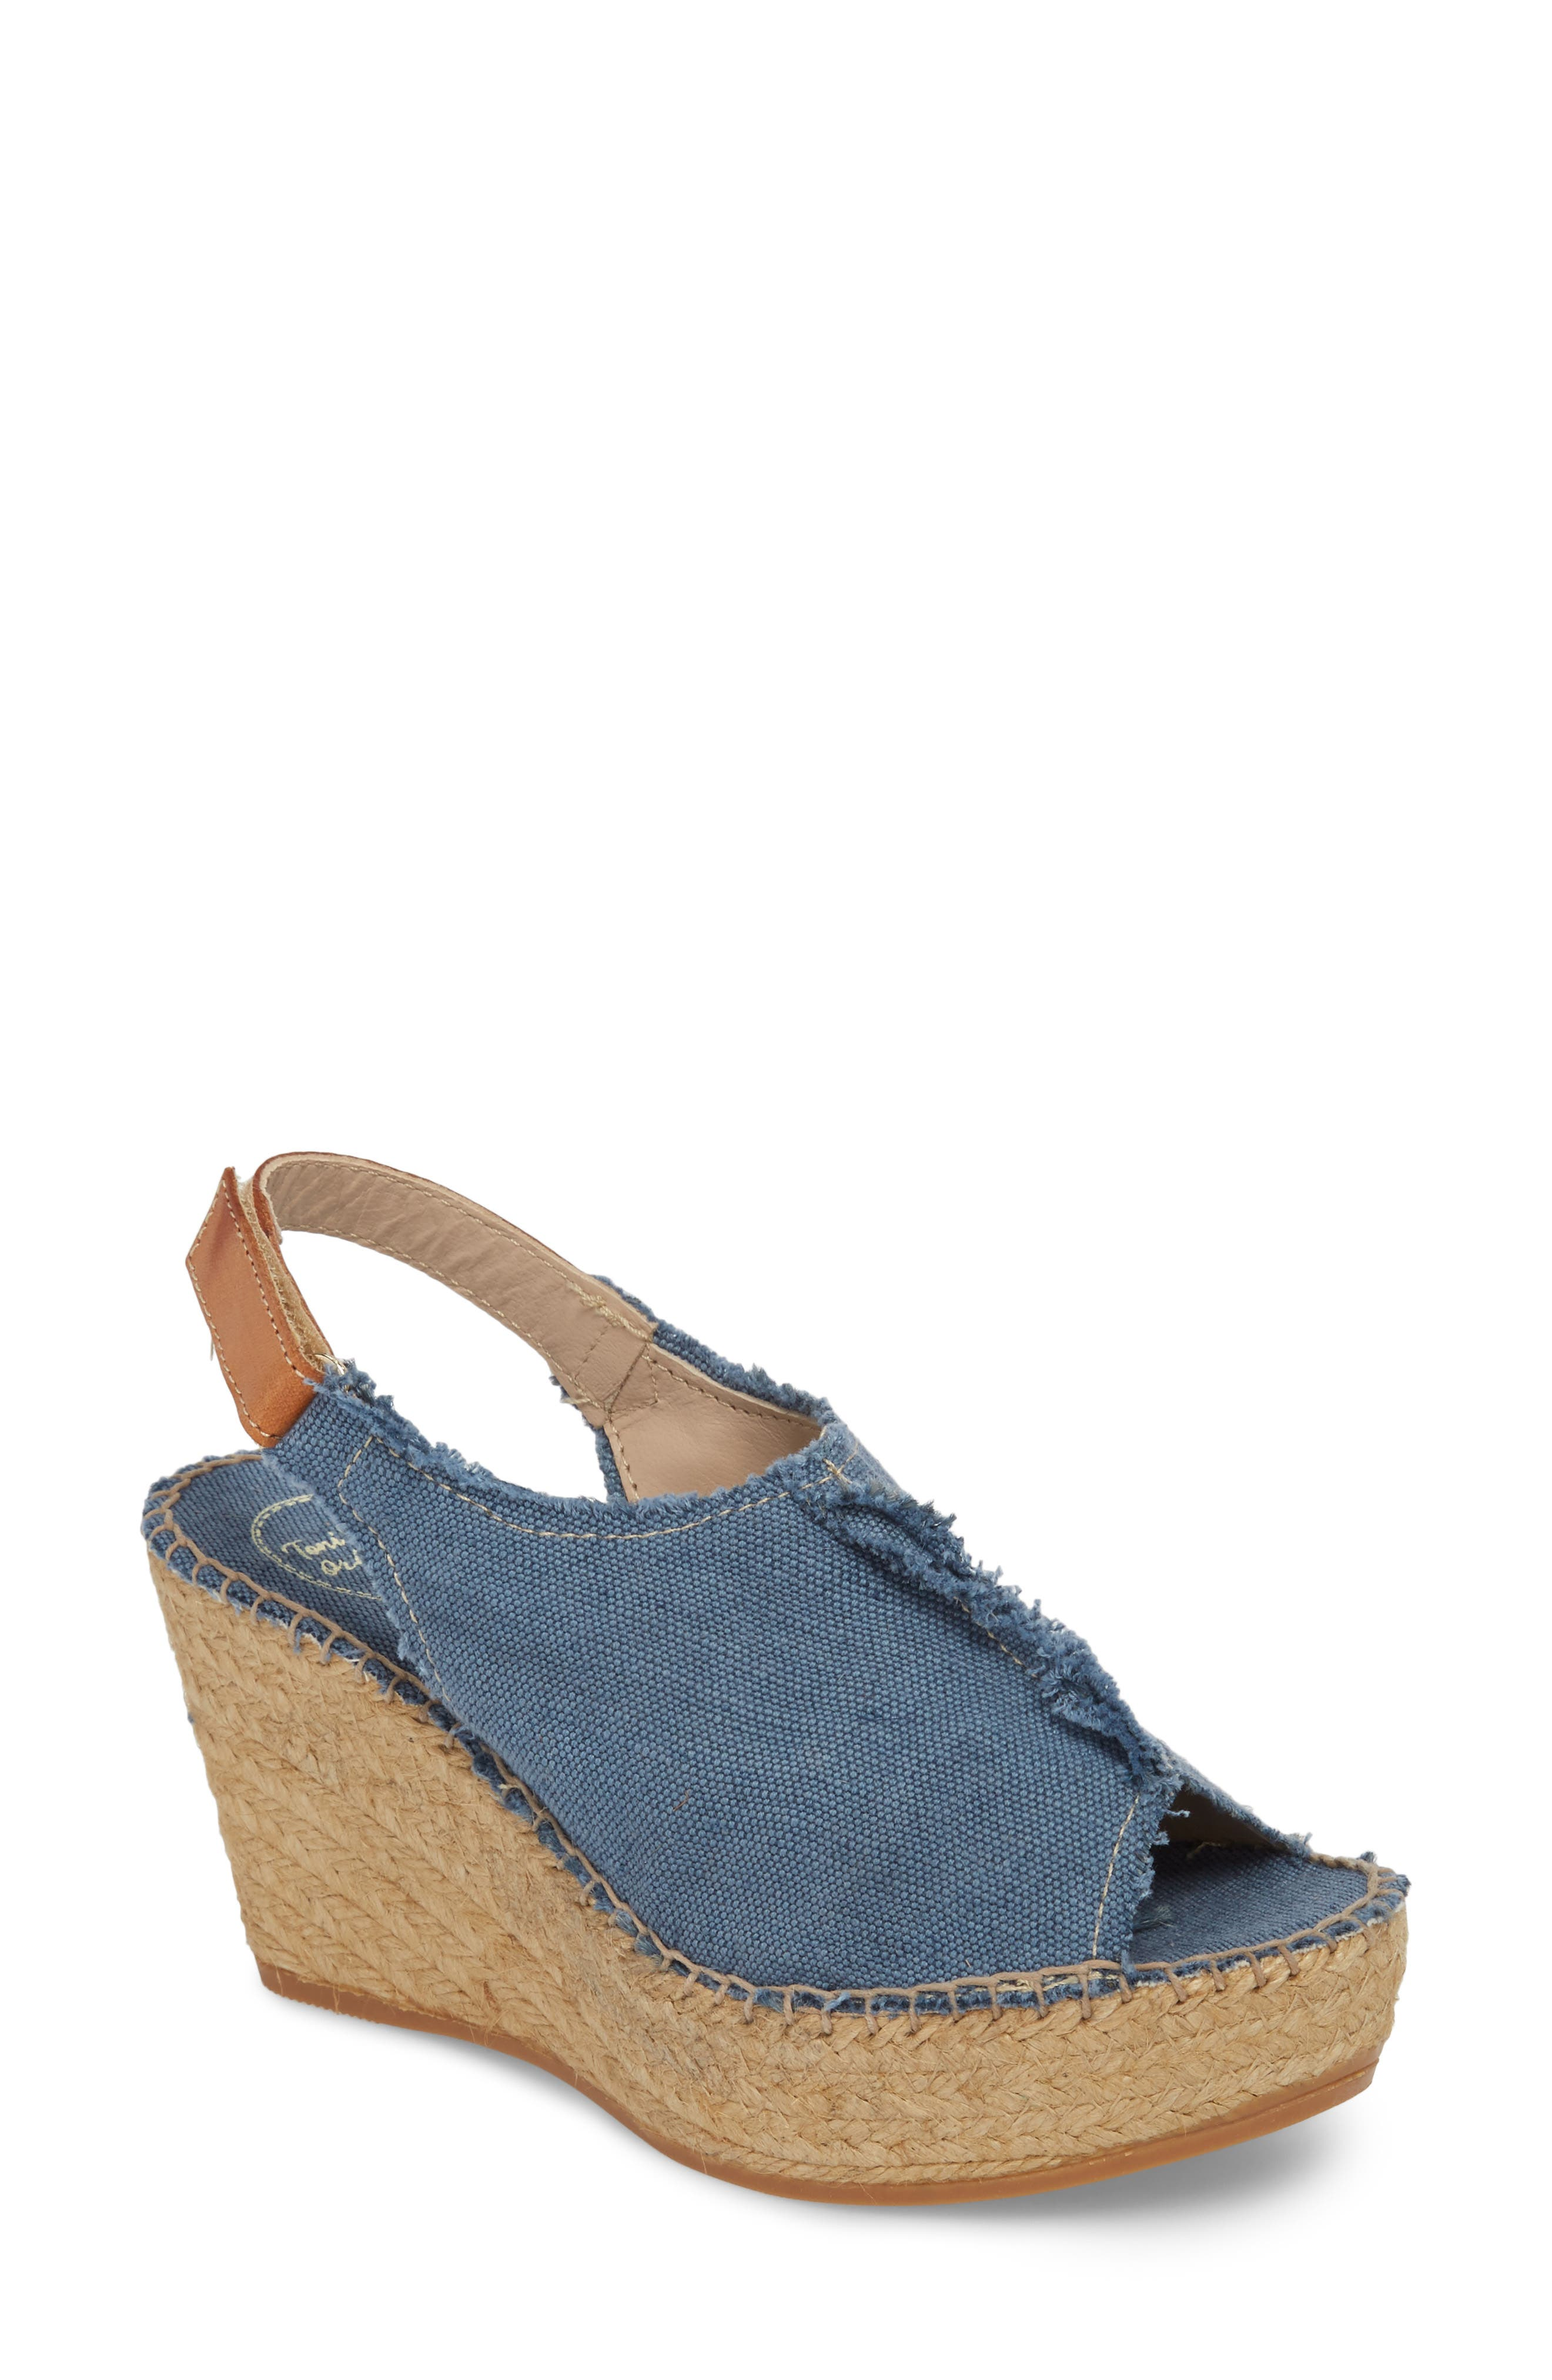 'Lugano' Espadrille Wedge Sandal,                             Main thumbnail 1, color,                             Blue Fabric